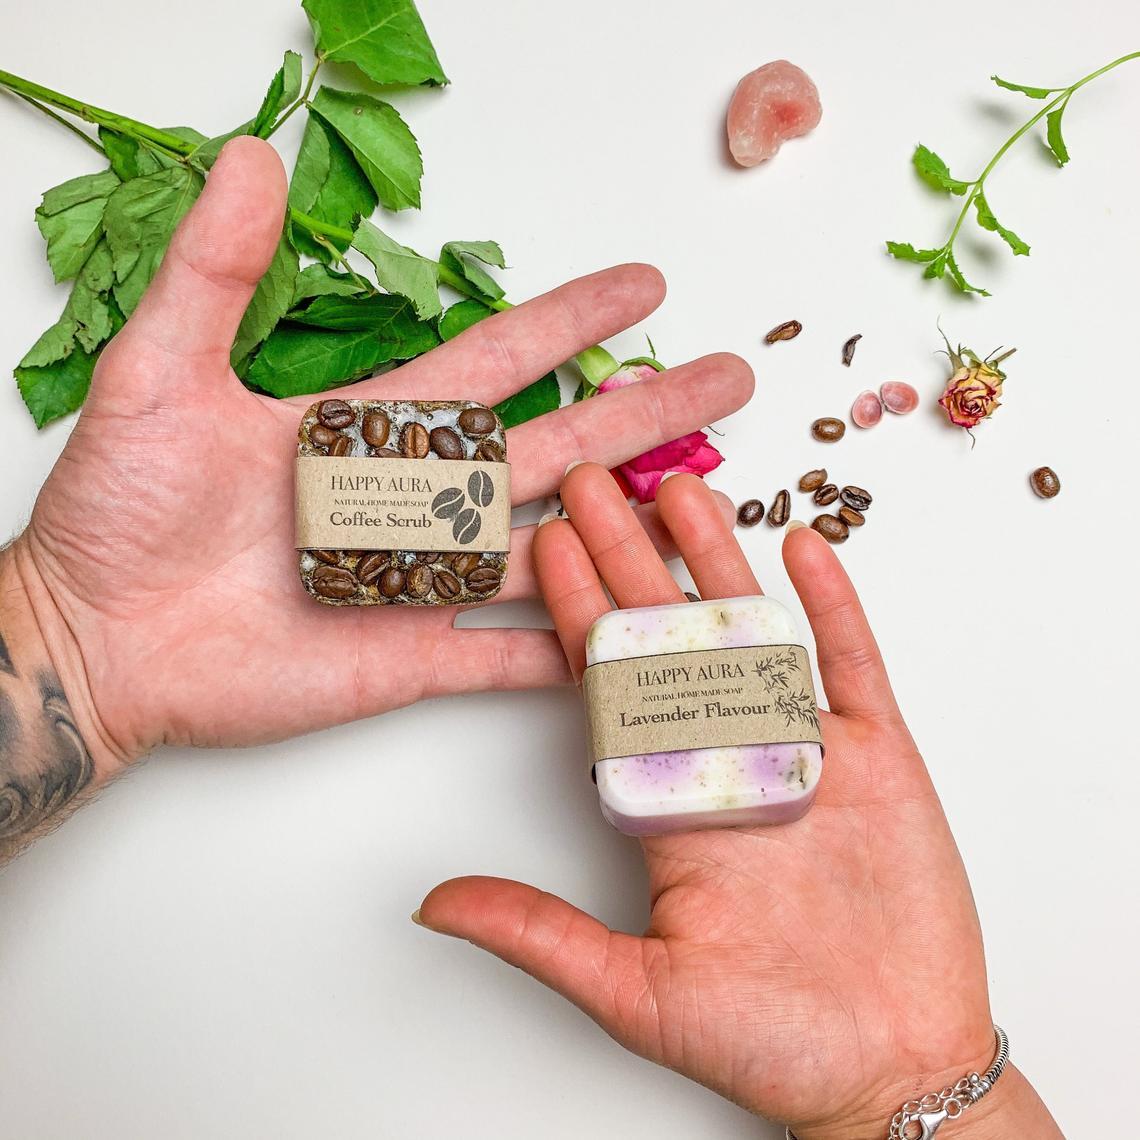 Coffee scrub and lavender soap - Happy Aura Ecofriendly Handmade Soaps (Etsy)